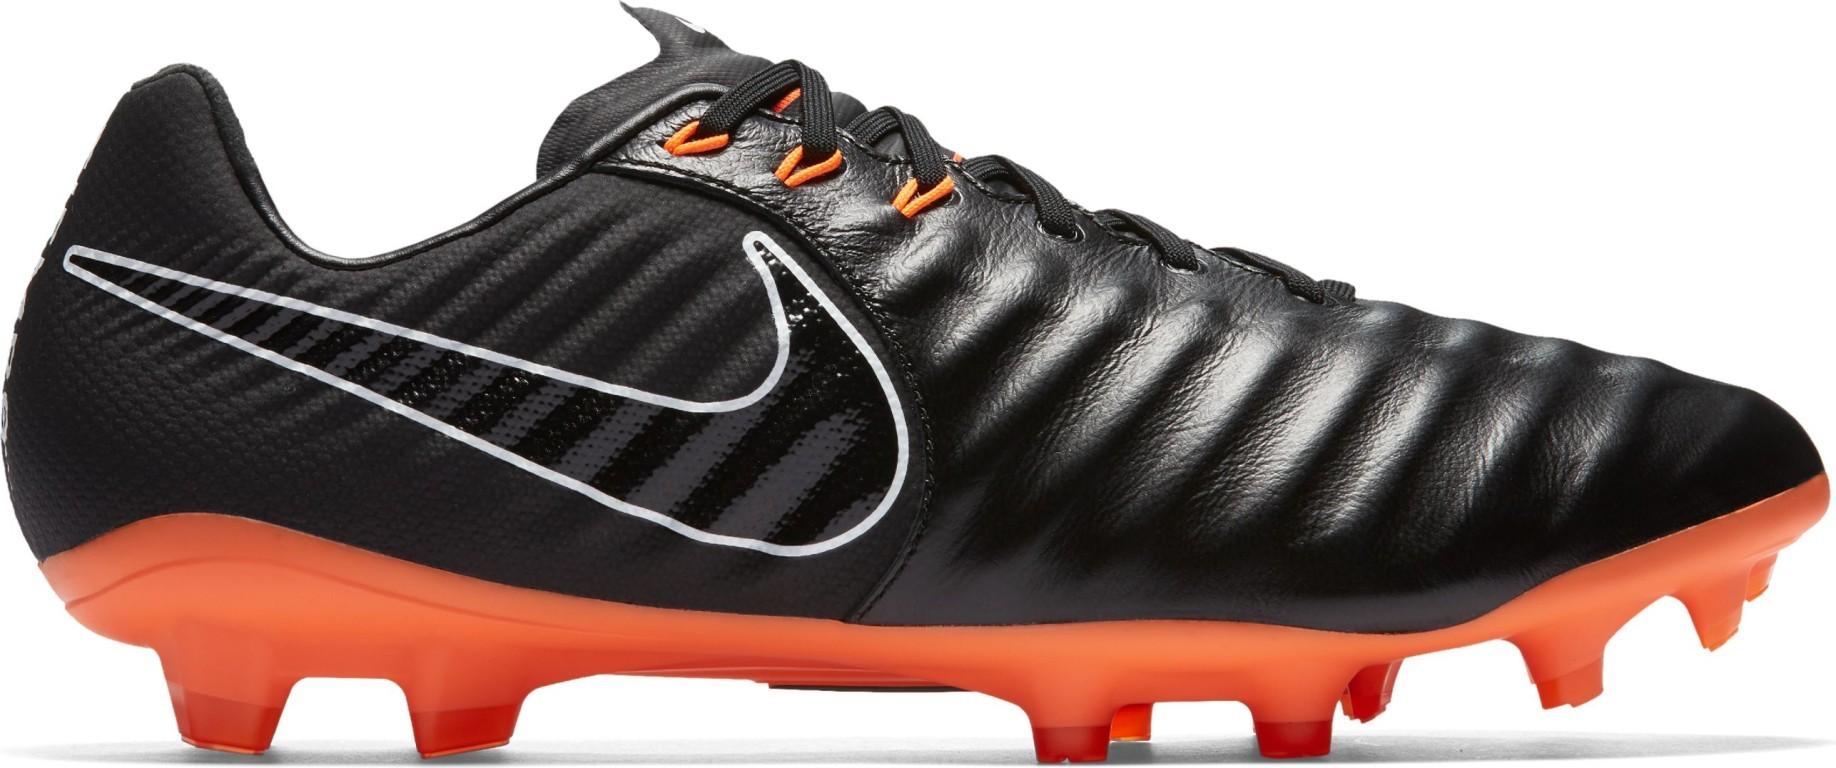 Football boots Nike Tiempo Legend VII Pro FG Fast AF Pack colore Black  Orange - Nike - SportIT.com 6556ac6995